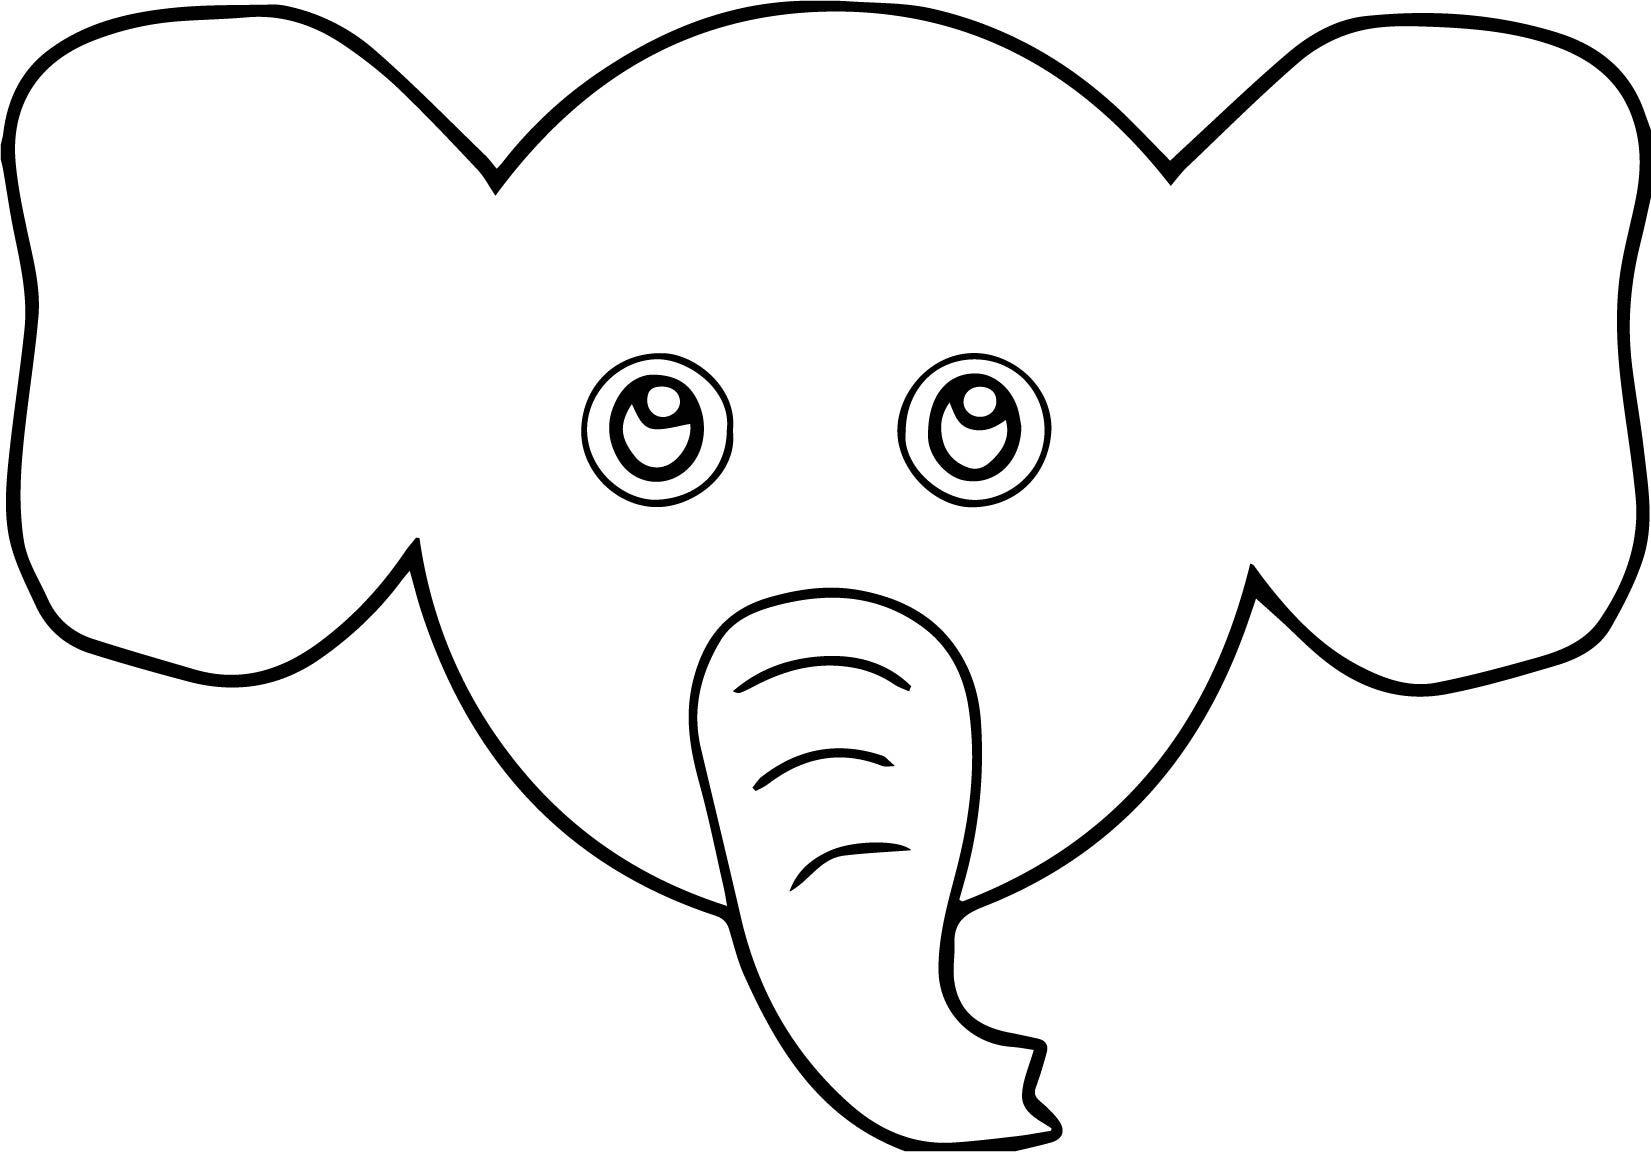 Elephant Face Cartoon Coloring Page Cartoon Coloring Pages Elephant Coloring Page Elephant Face